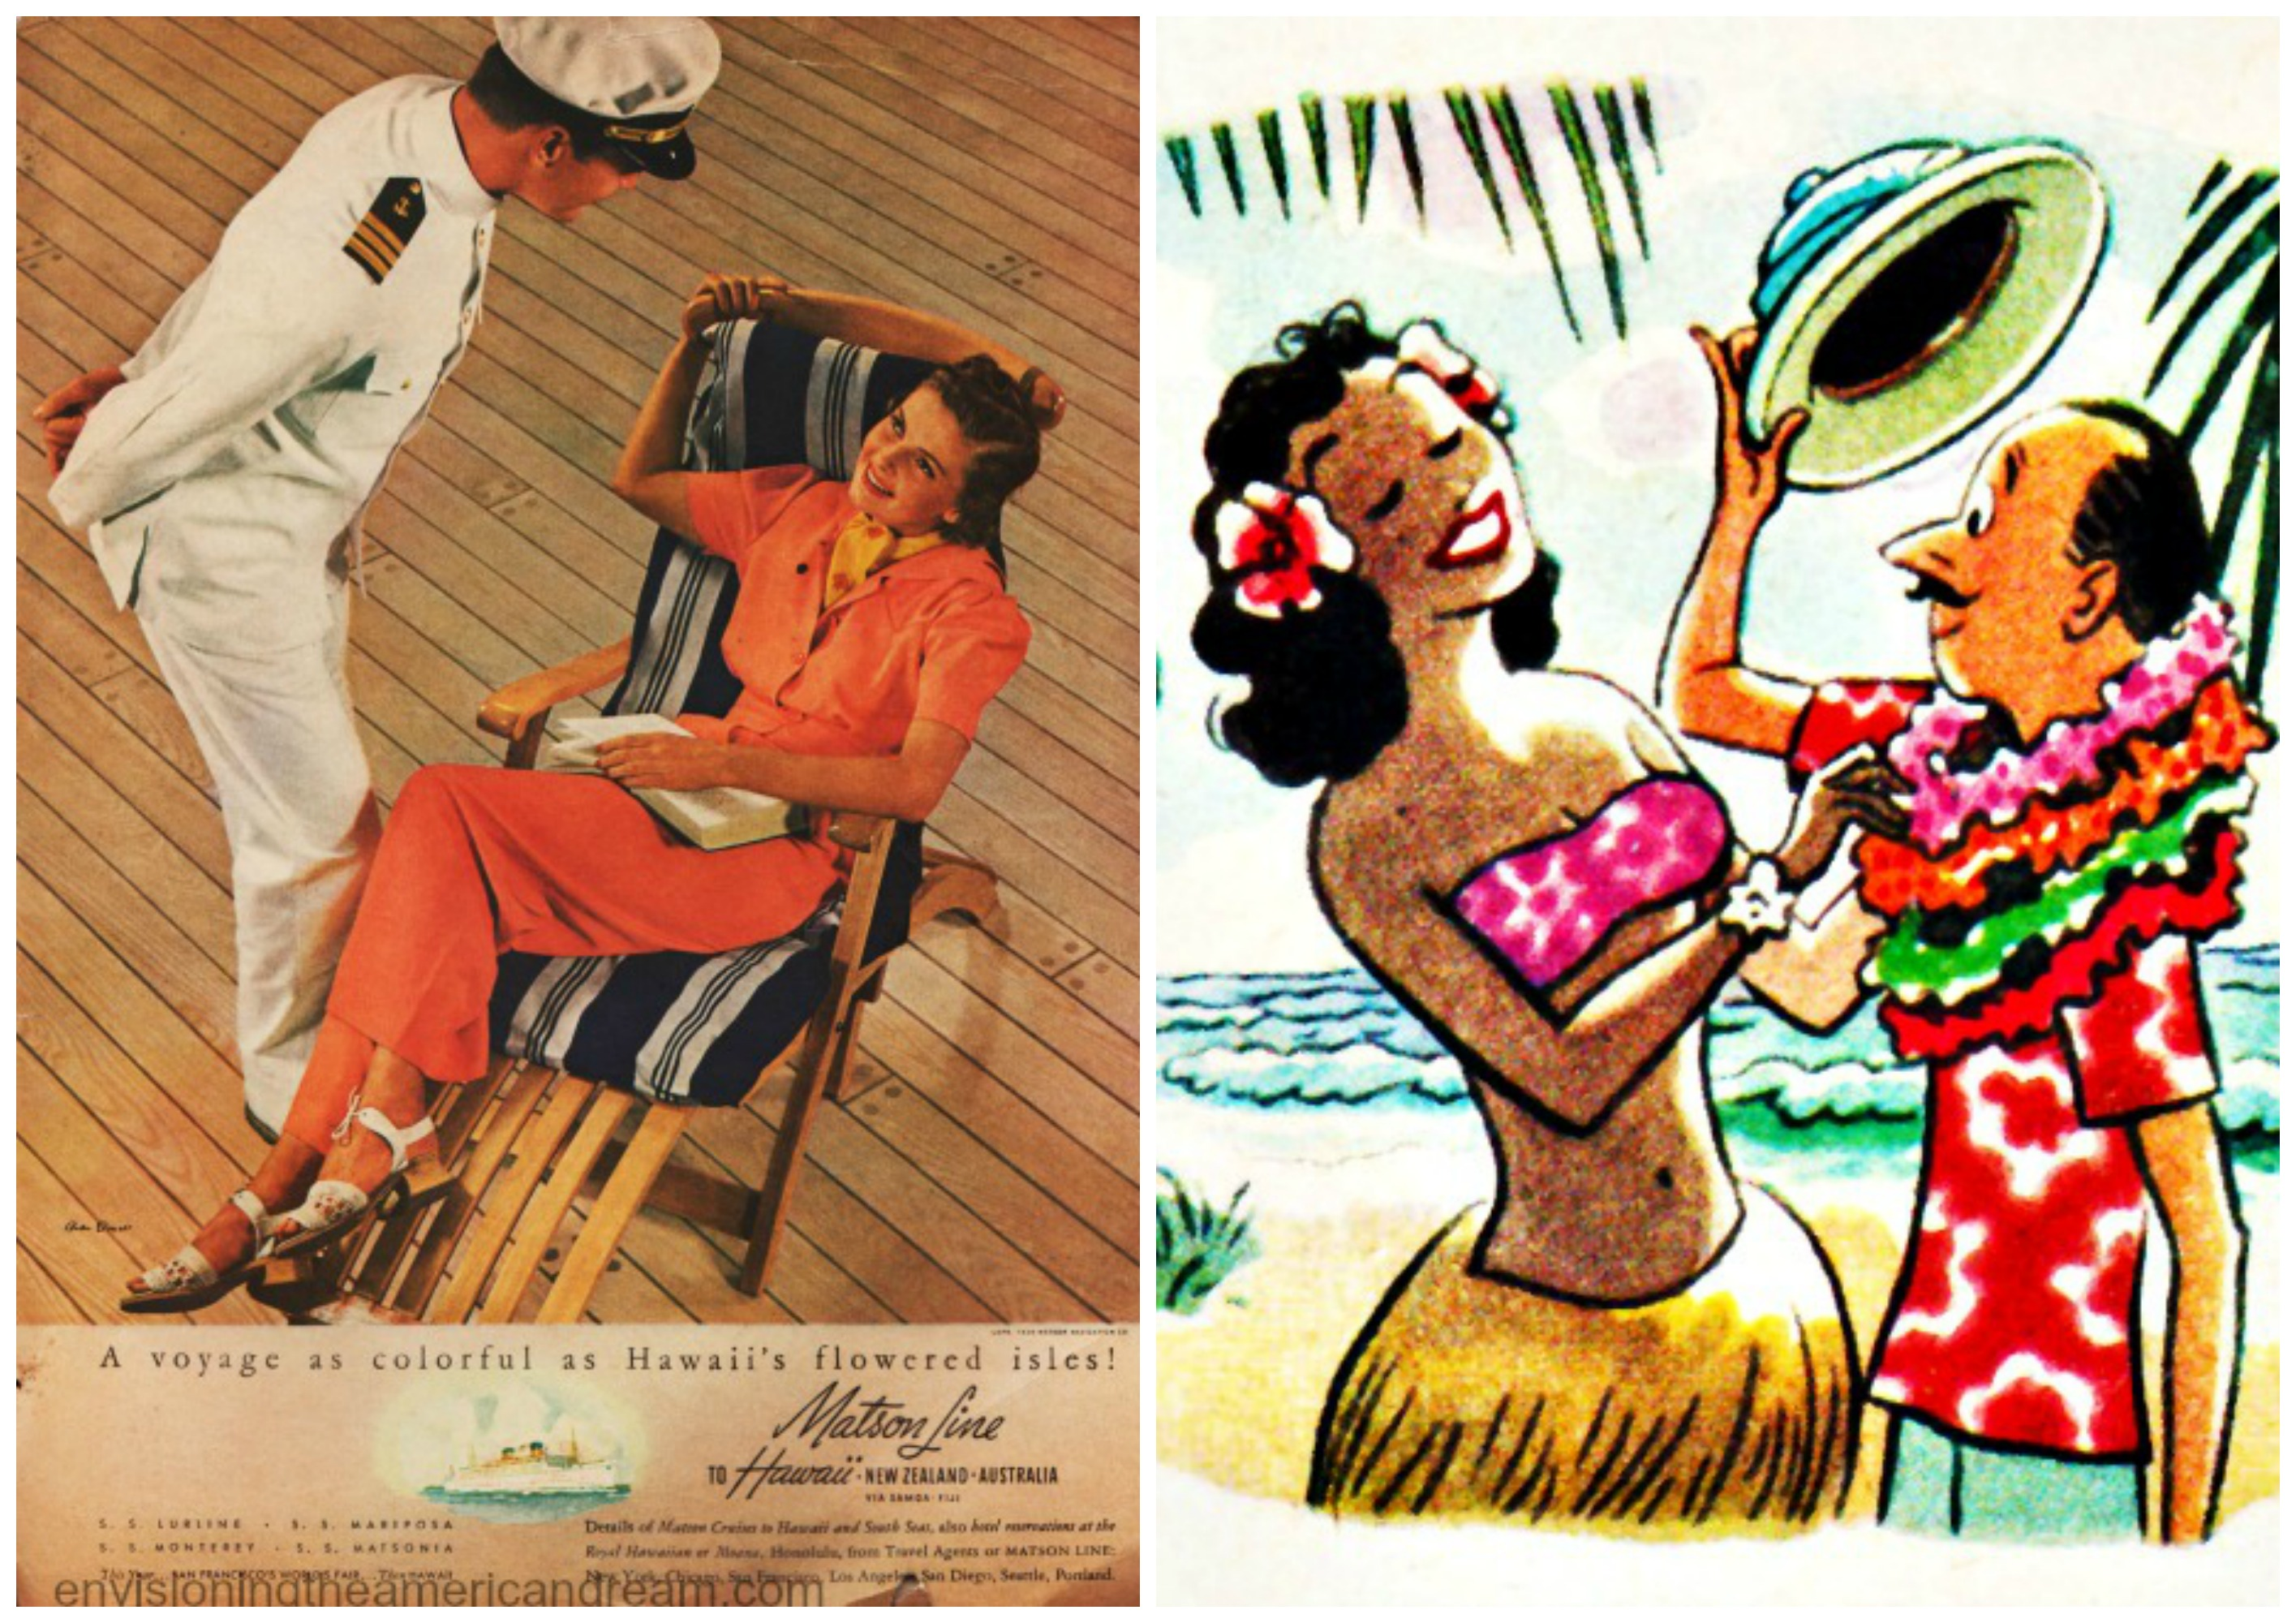 Remembering Pearl Harbor | Envisioning The American Dream